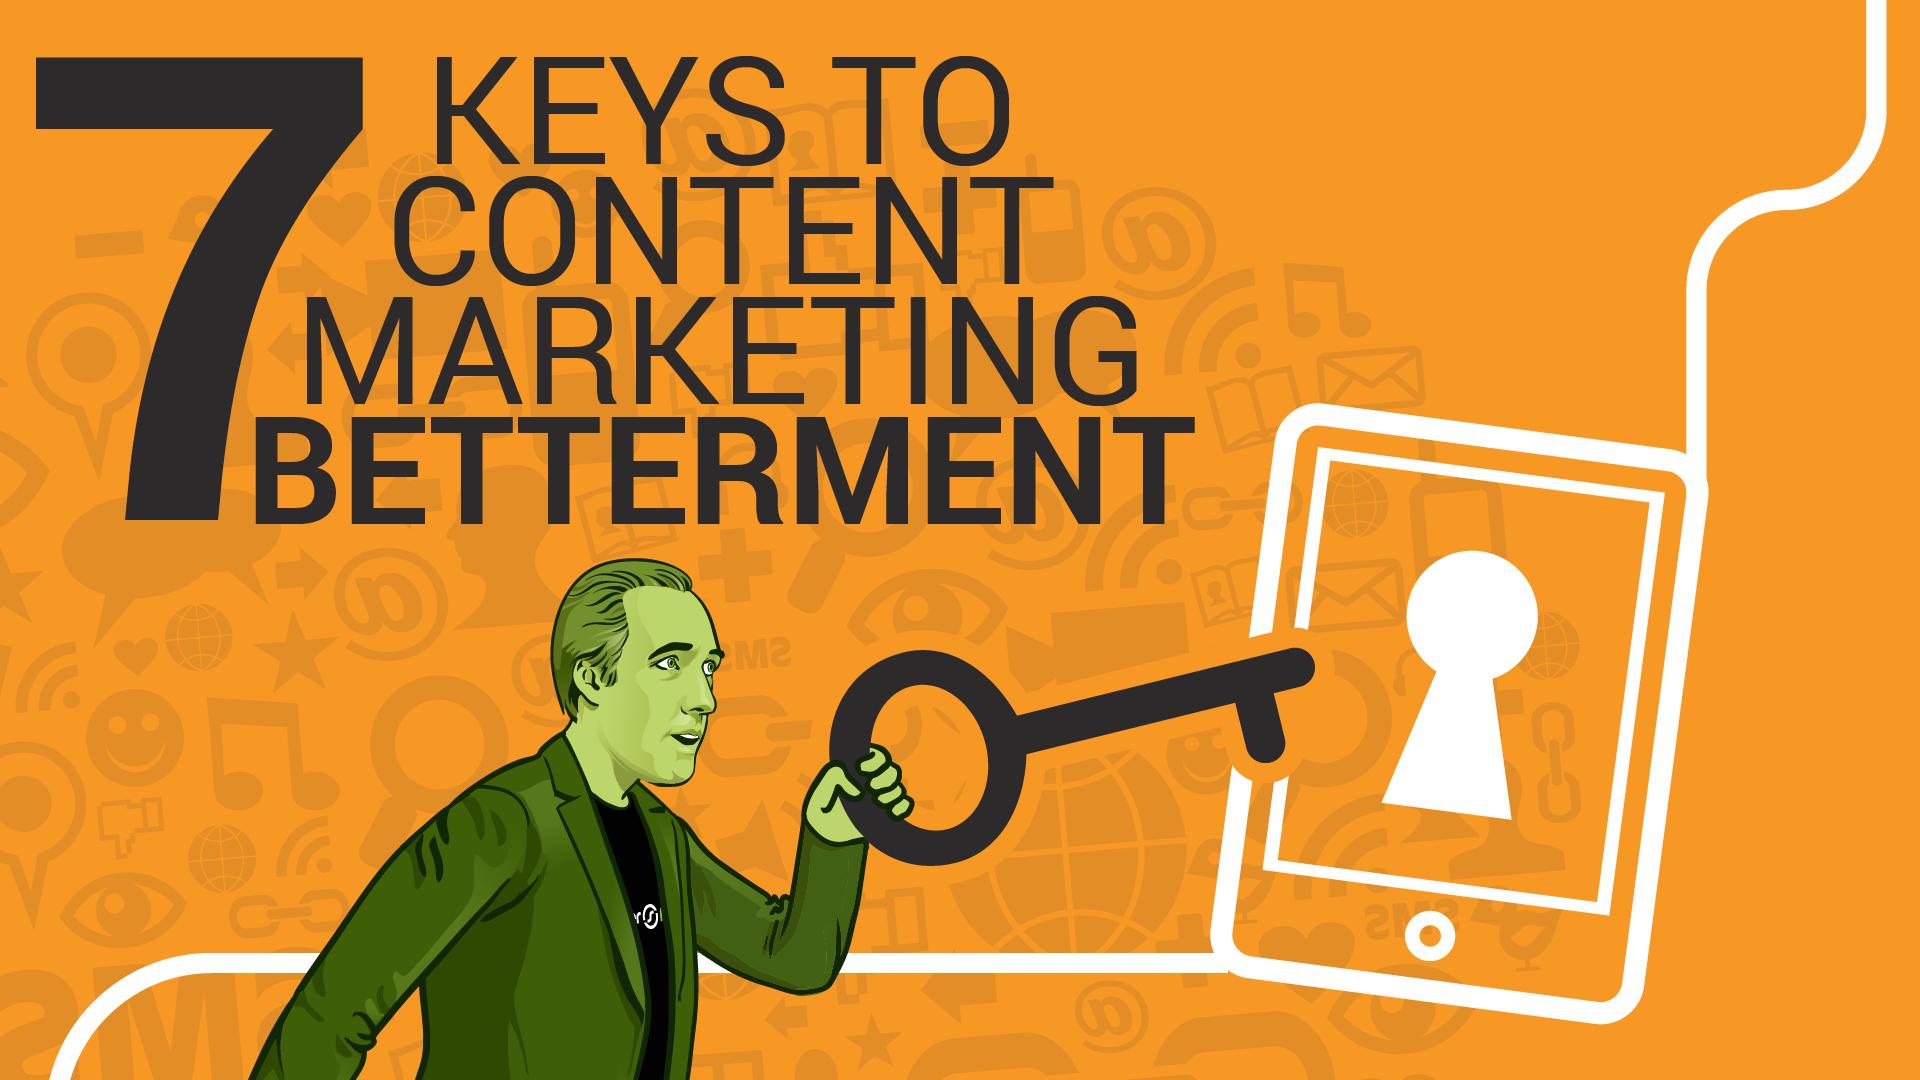 7 Keys to Content Marketing Betterment